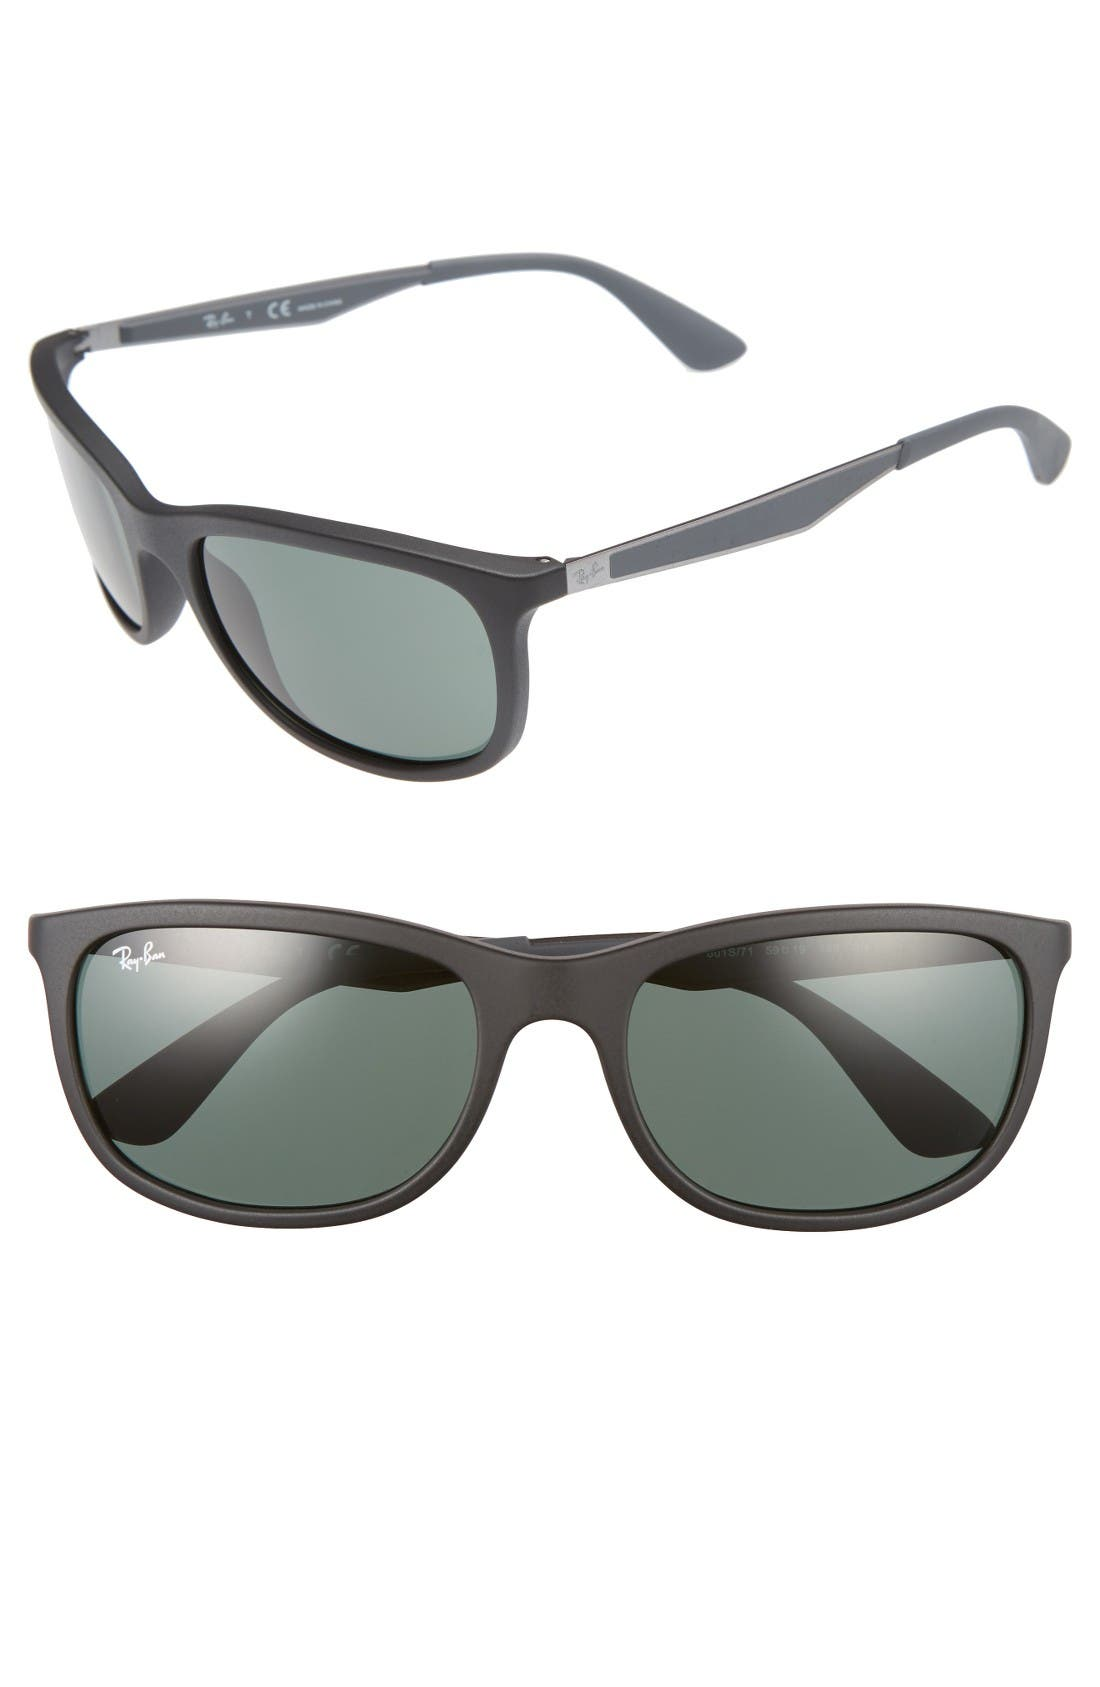 Wayfarer 59mm Sunglasses,                             Main thumbnail 1, color,                             Matte Black/Green